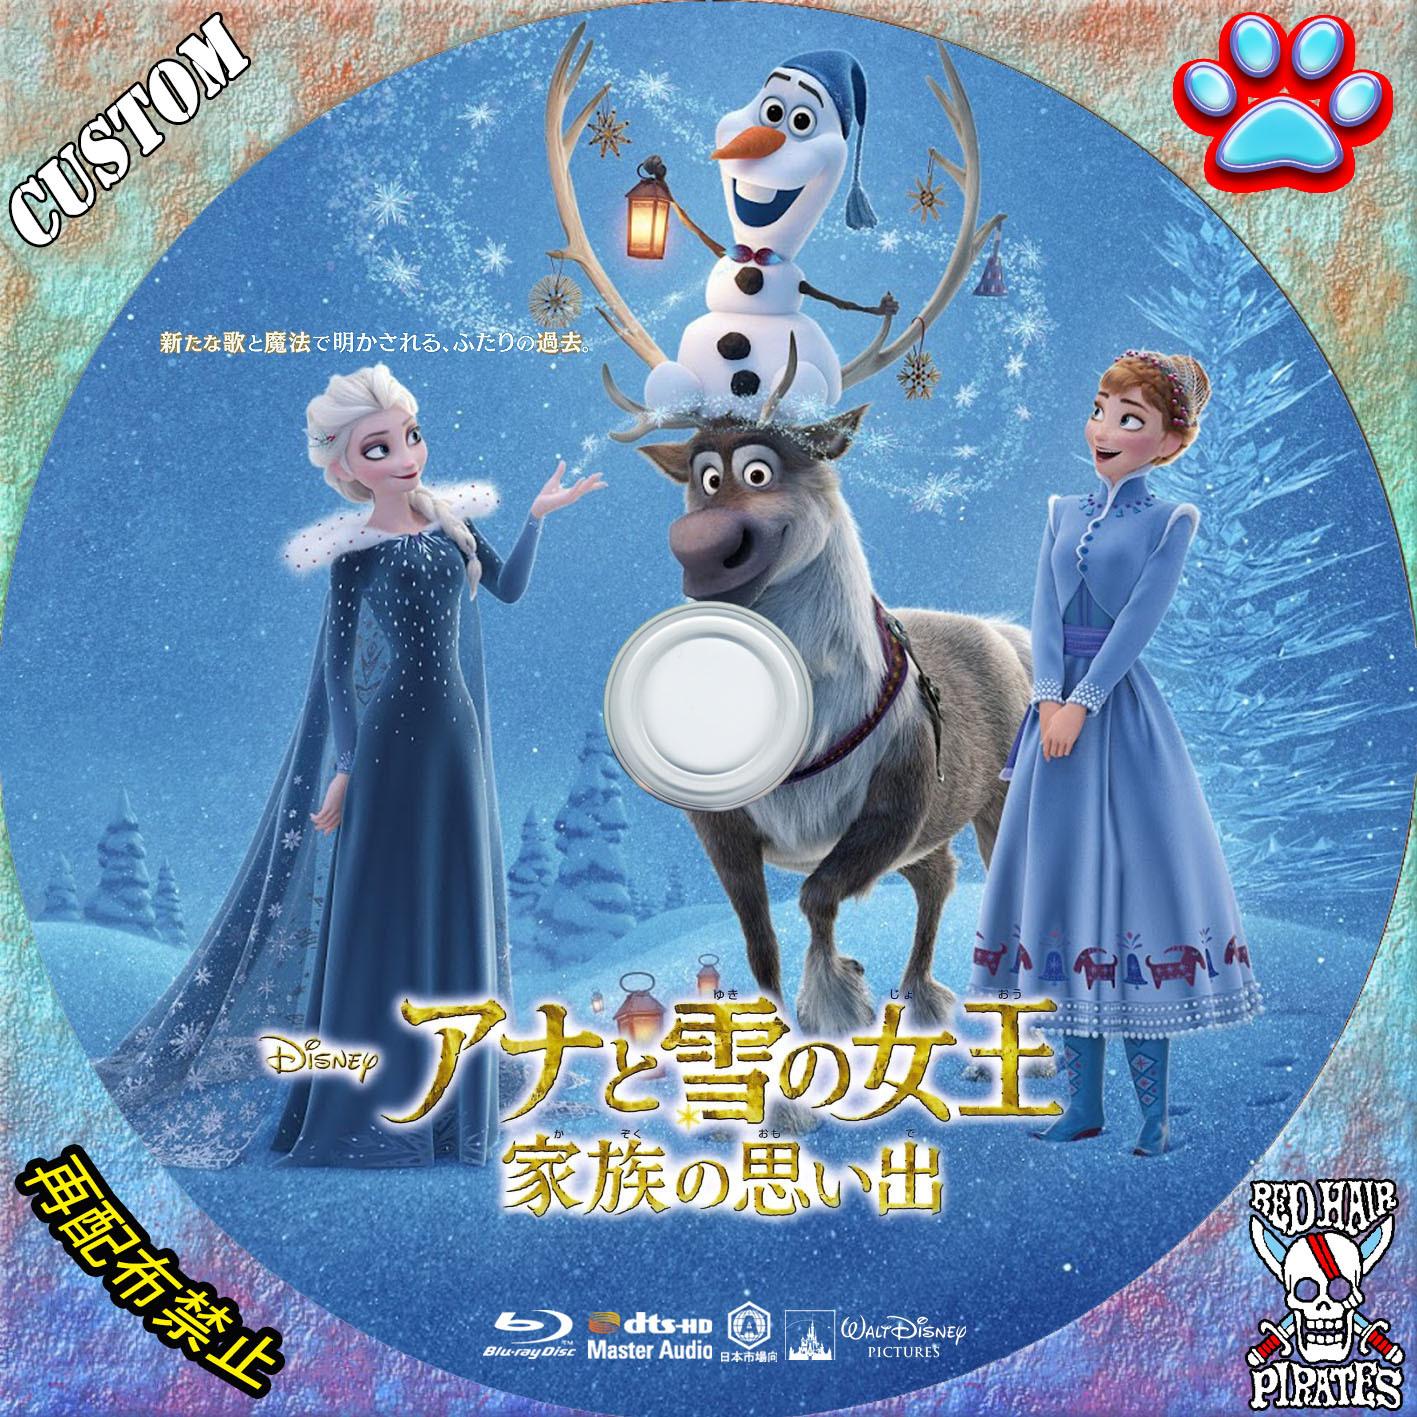 Amazon.co.jp | アナと雪の女王/家族の思い出 ブルーレイ+DVDセット [Blu-ray] DVD ...